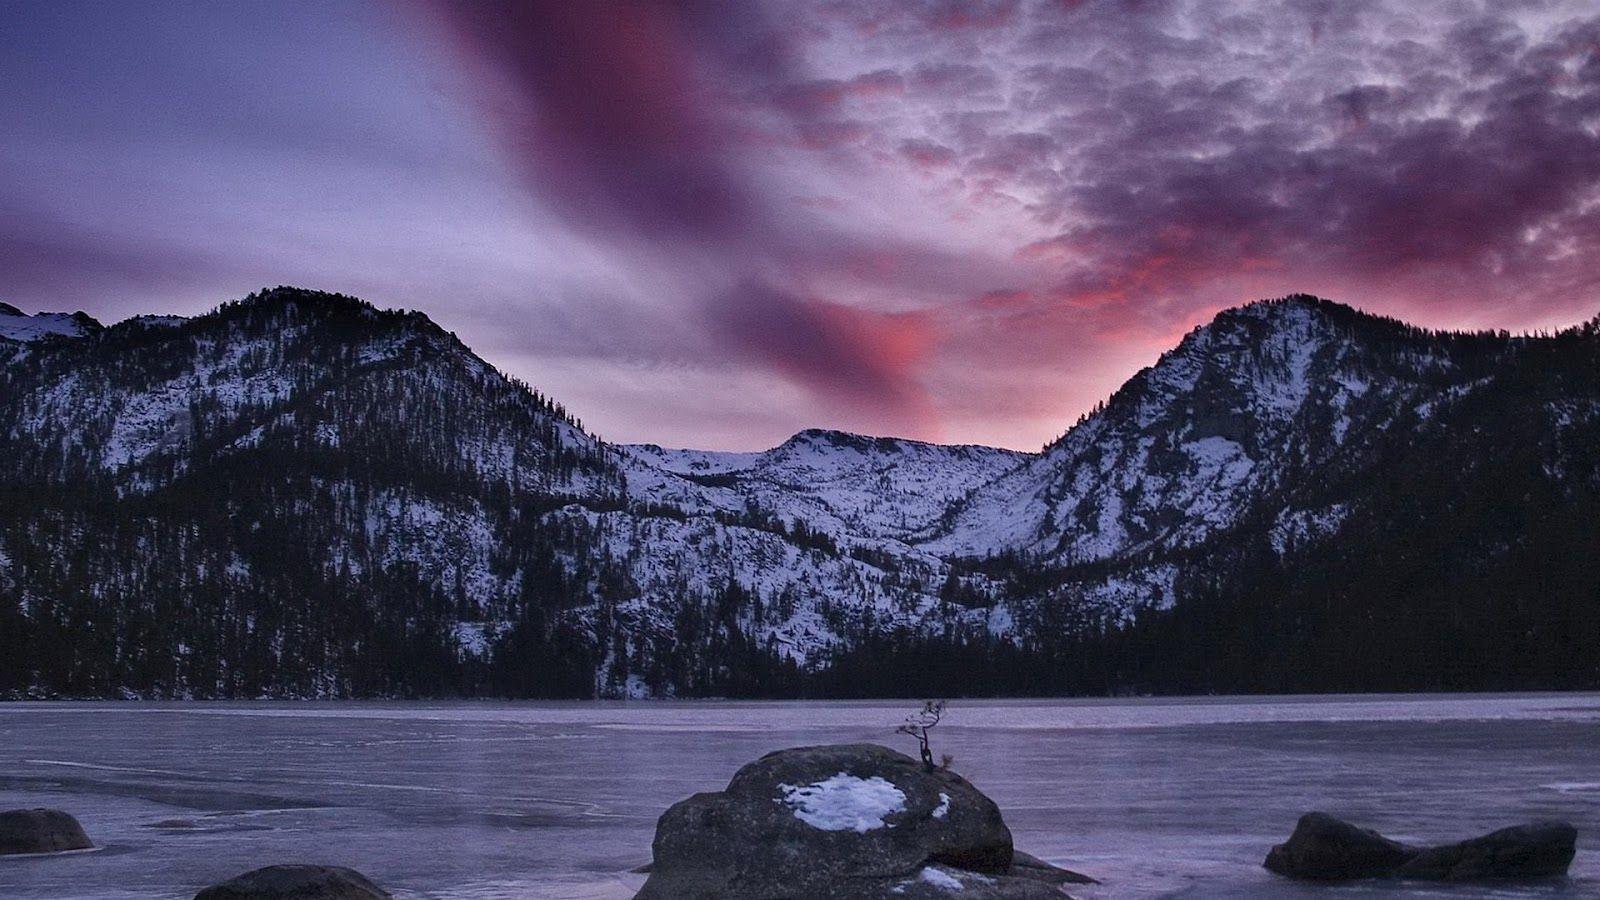 1600x900 Sweetcouple Nature Hd Wallpapers Ice Snow Mountain Lake Sierra Nevada Nevada California Sierra Nevada Mountains Hd wallpaper lake ice mountains valley